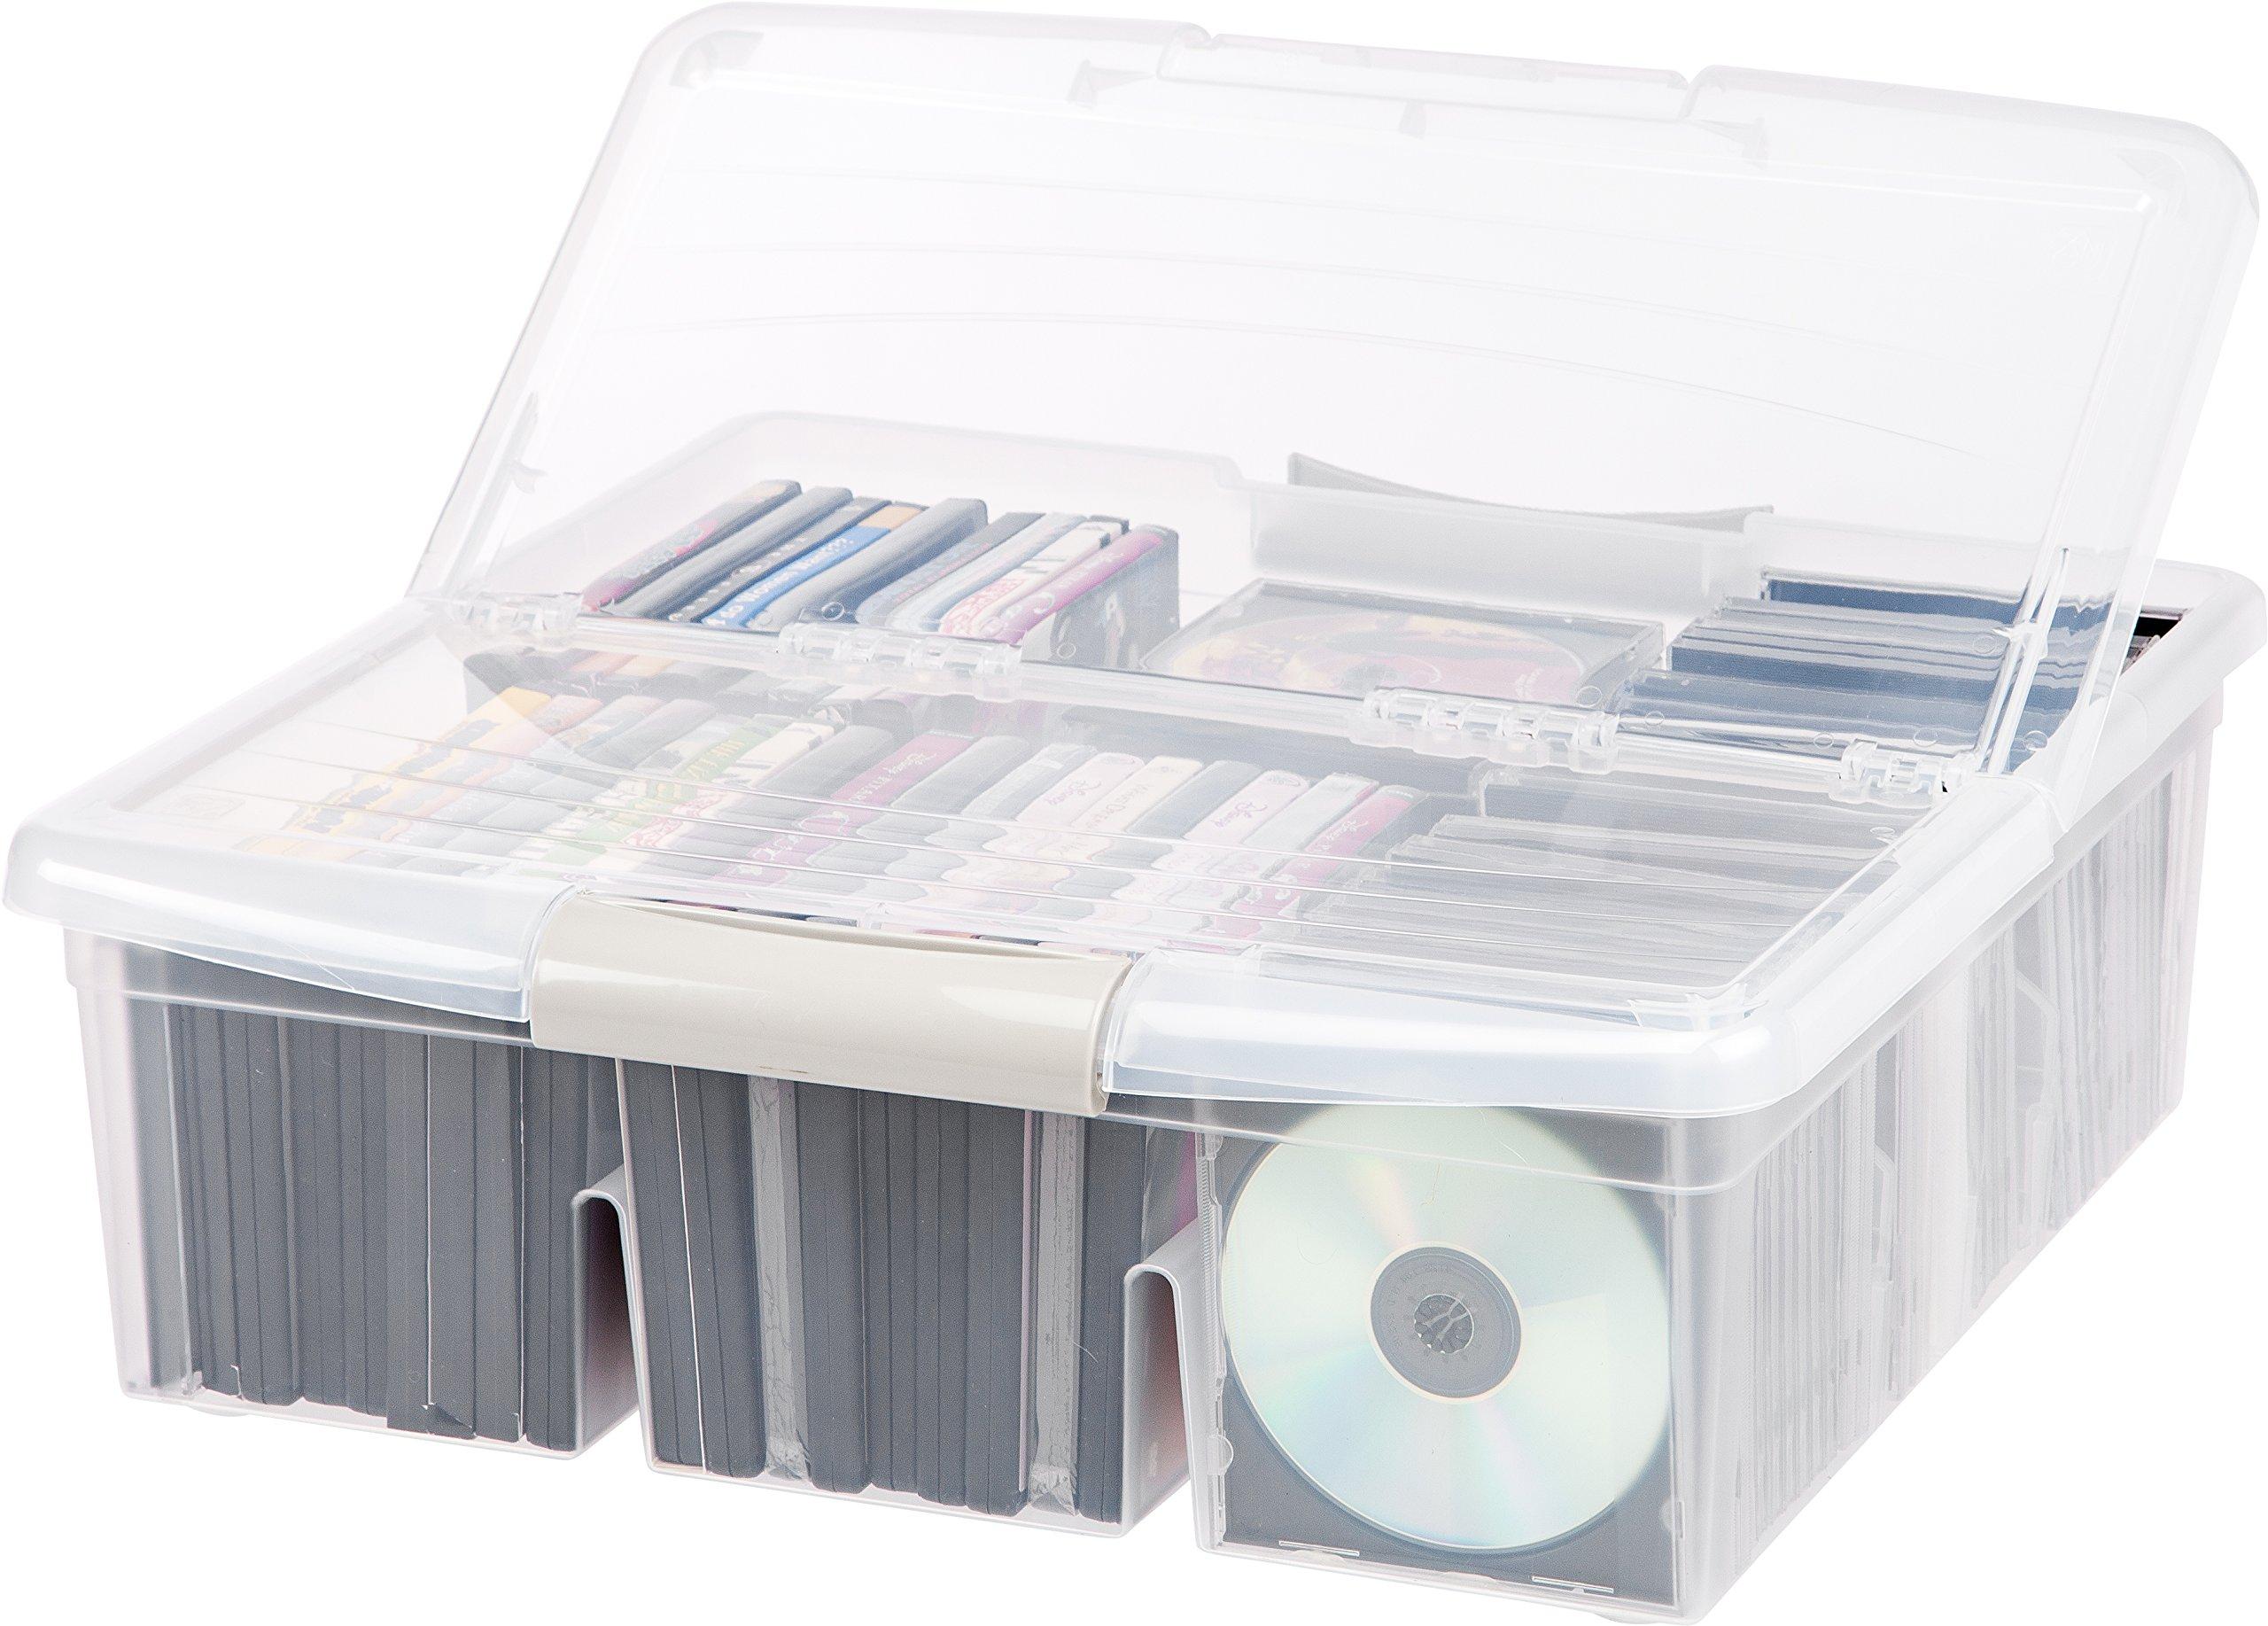 IRIS Large Divided Media Storage Box, Clear by IRIS USA, Inc. (Image #3)